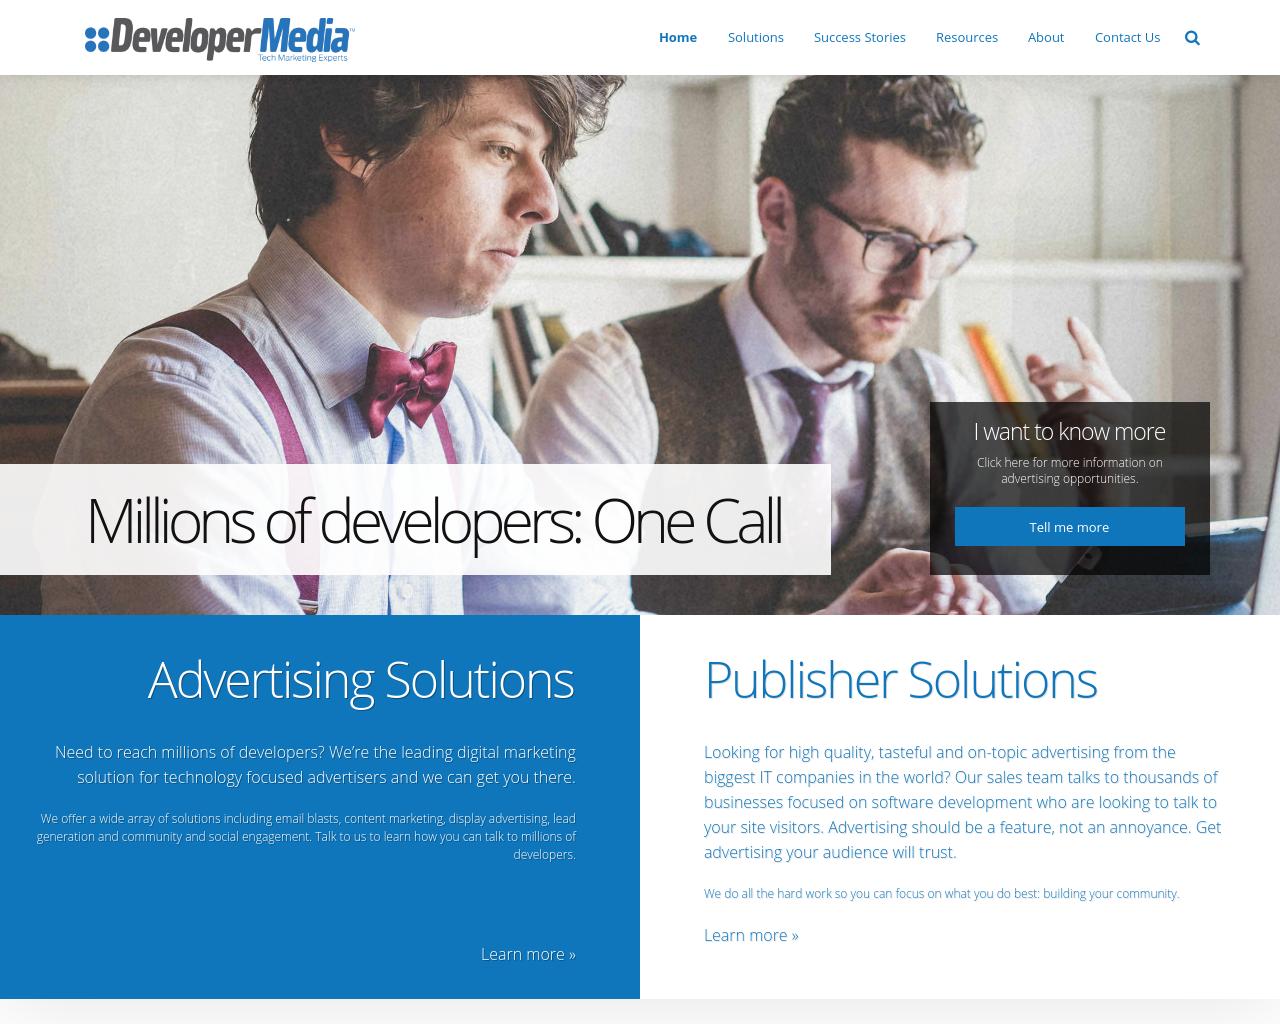 Developer-Media-/-Lake-Quincy-Media-Advertising-Reviews-Pricing